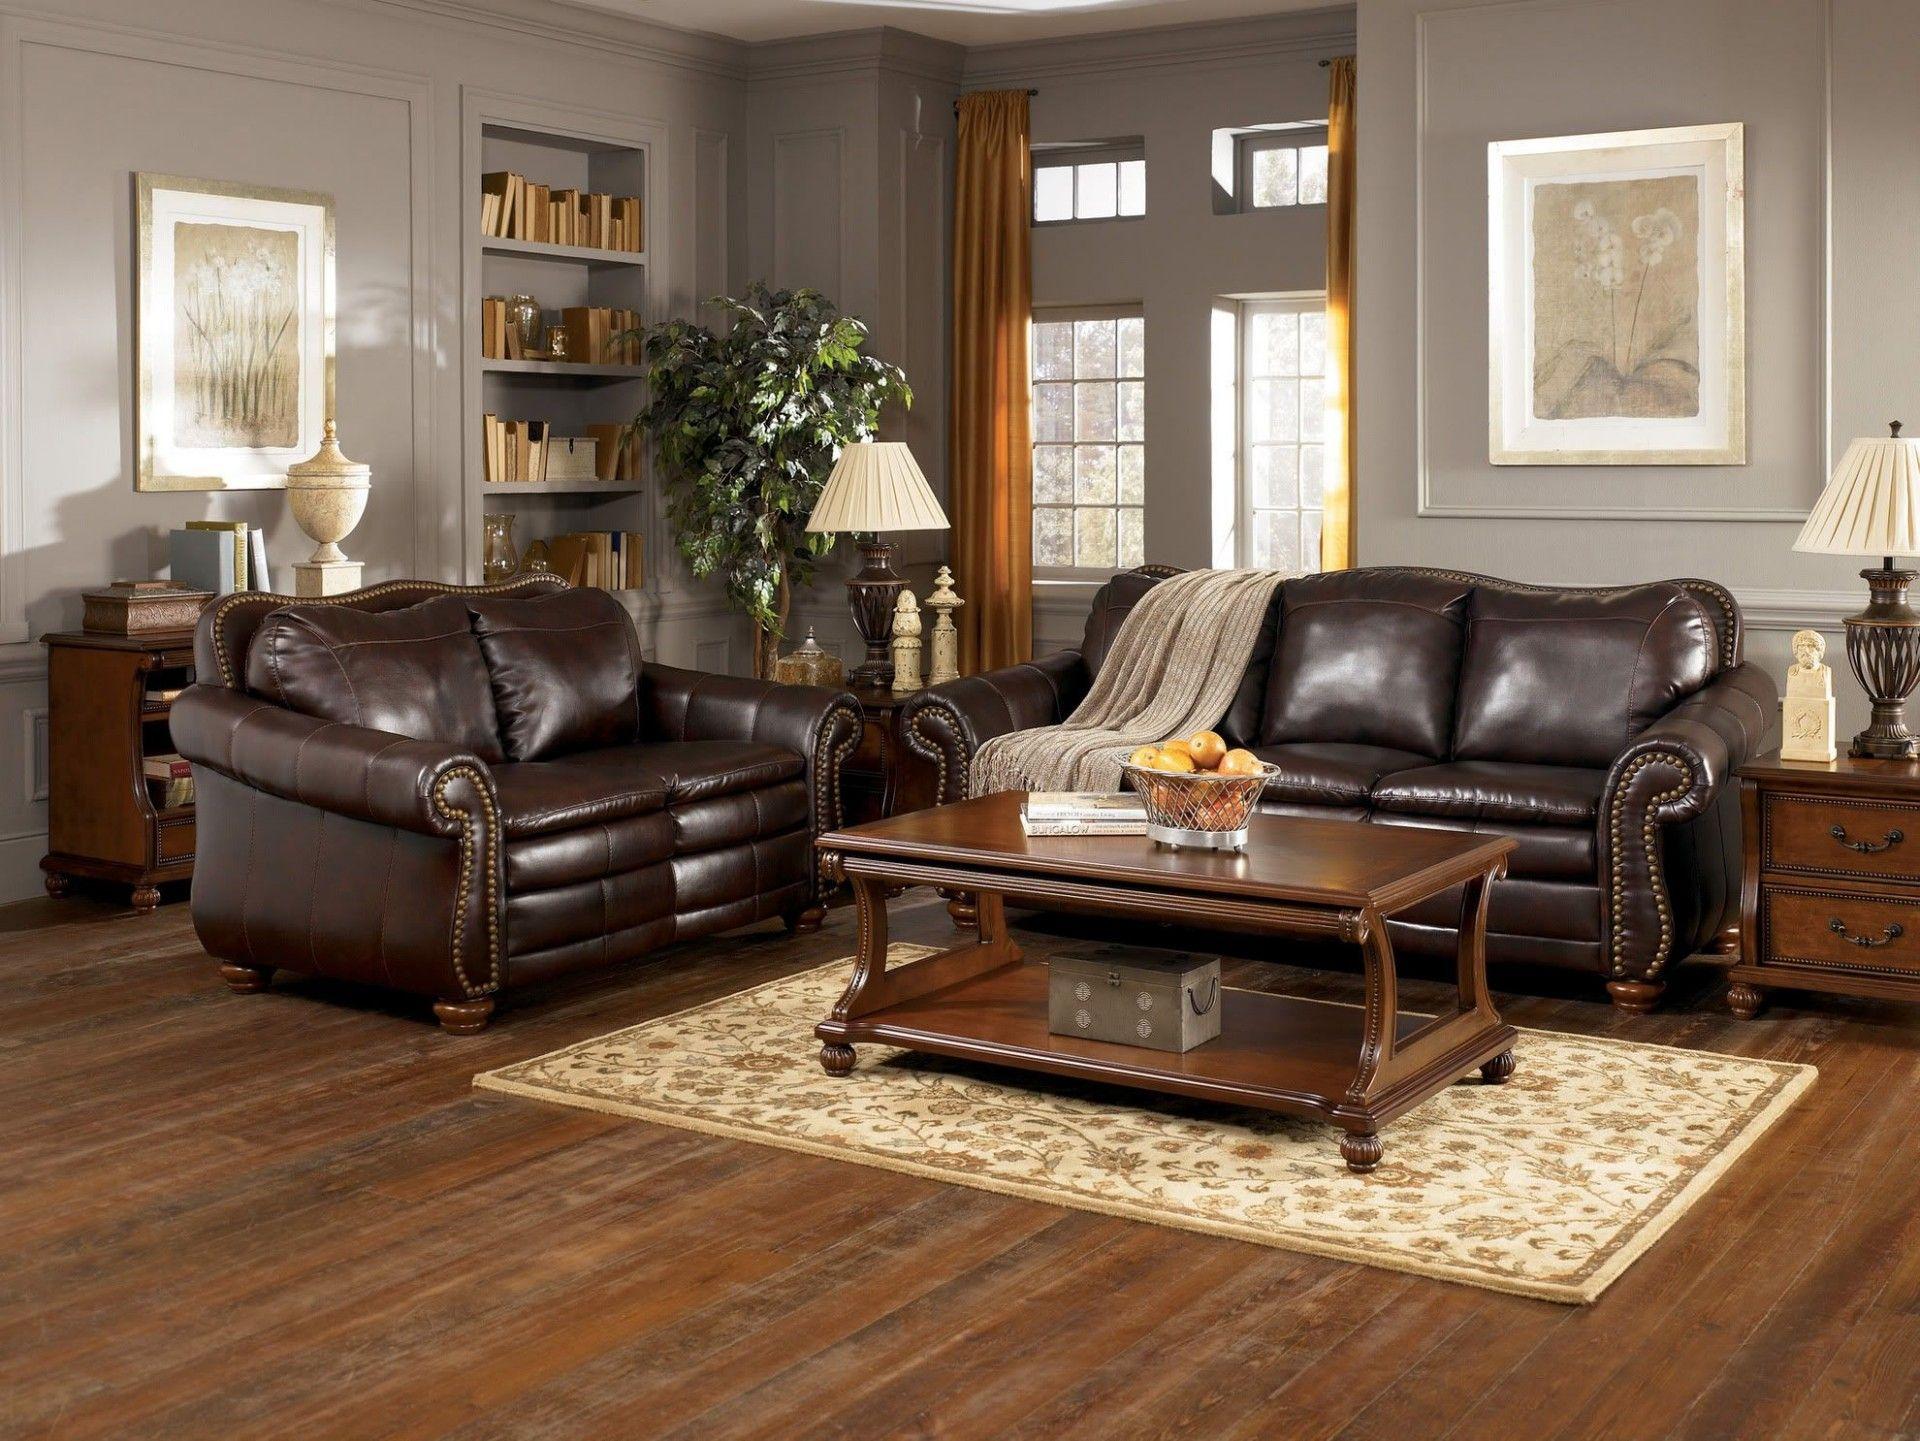 Living Room Grey Walls Brown Furniture